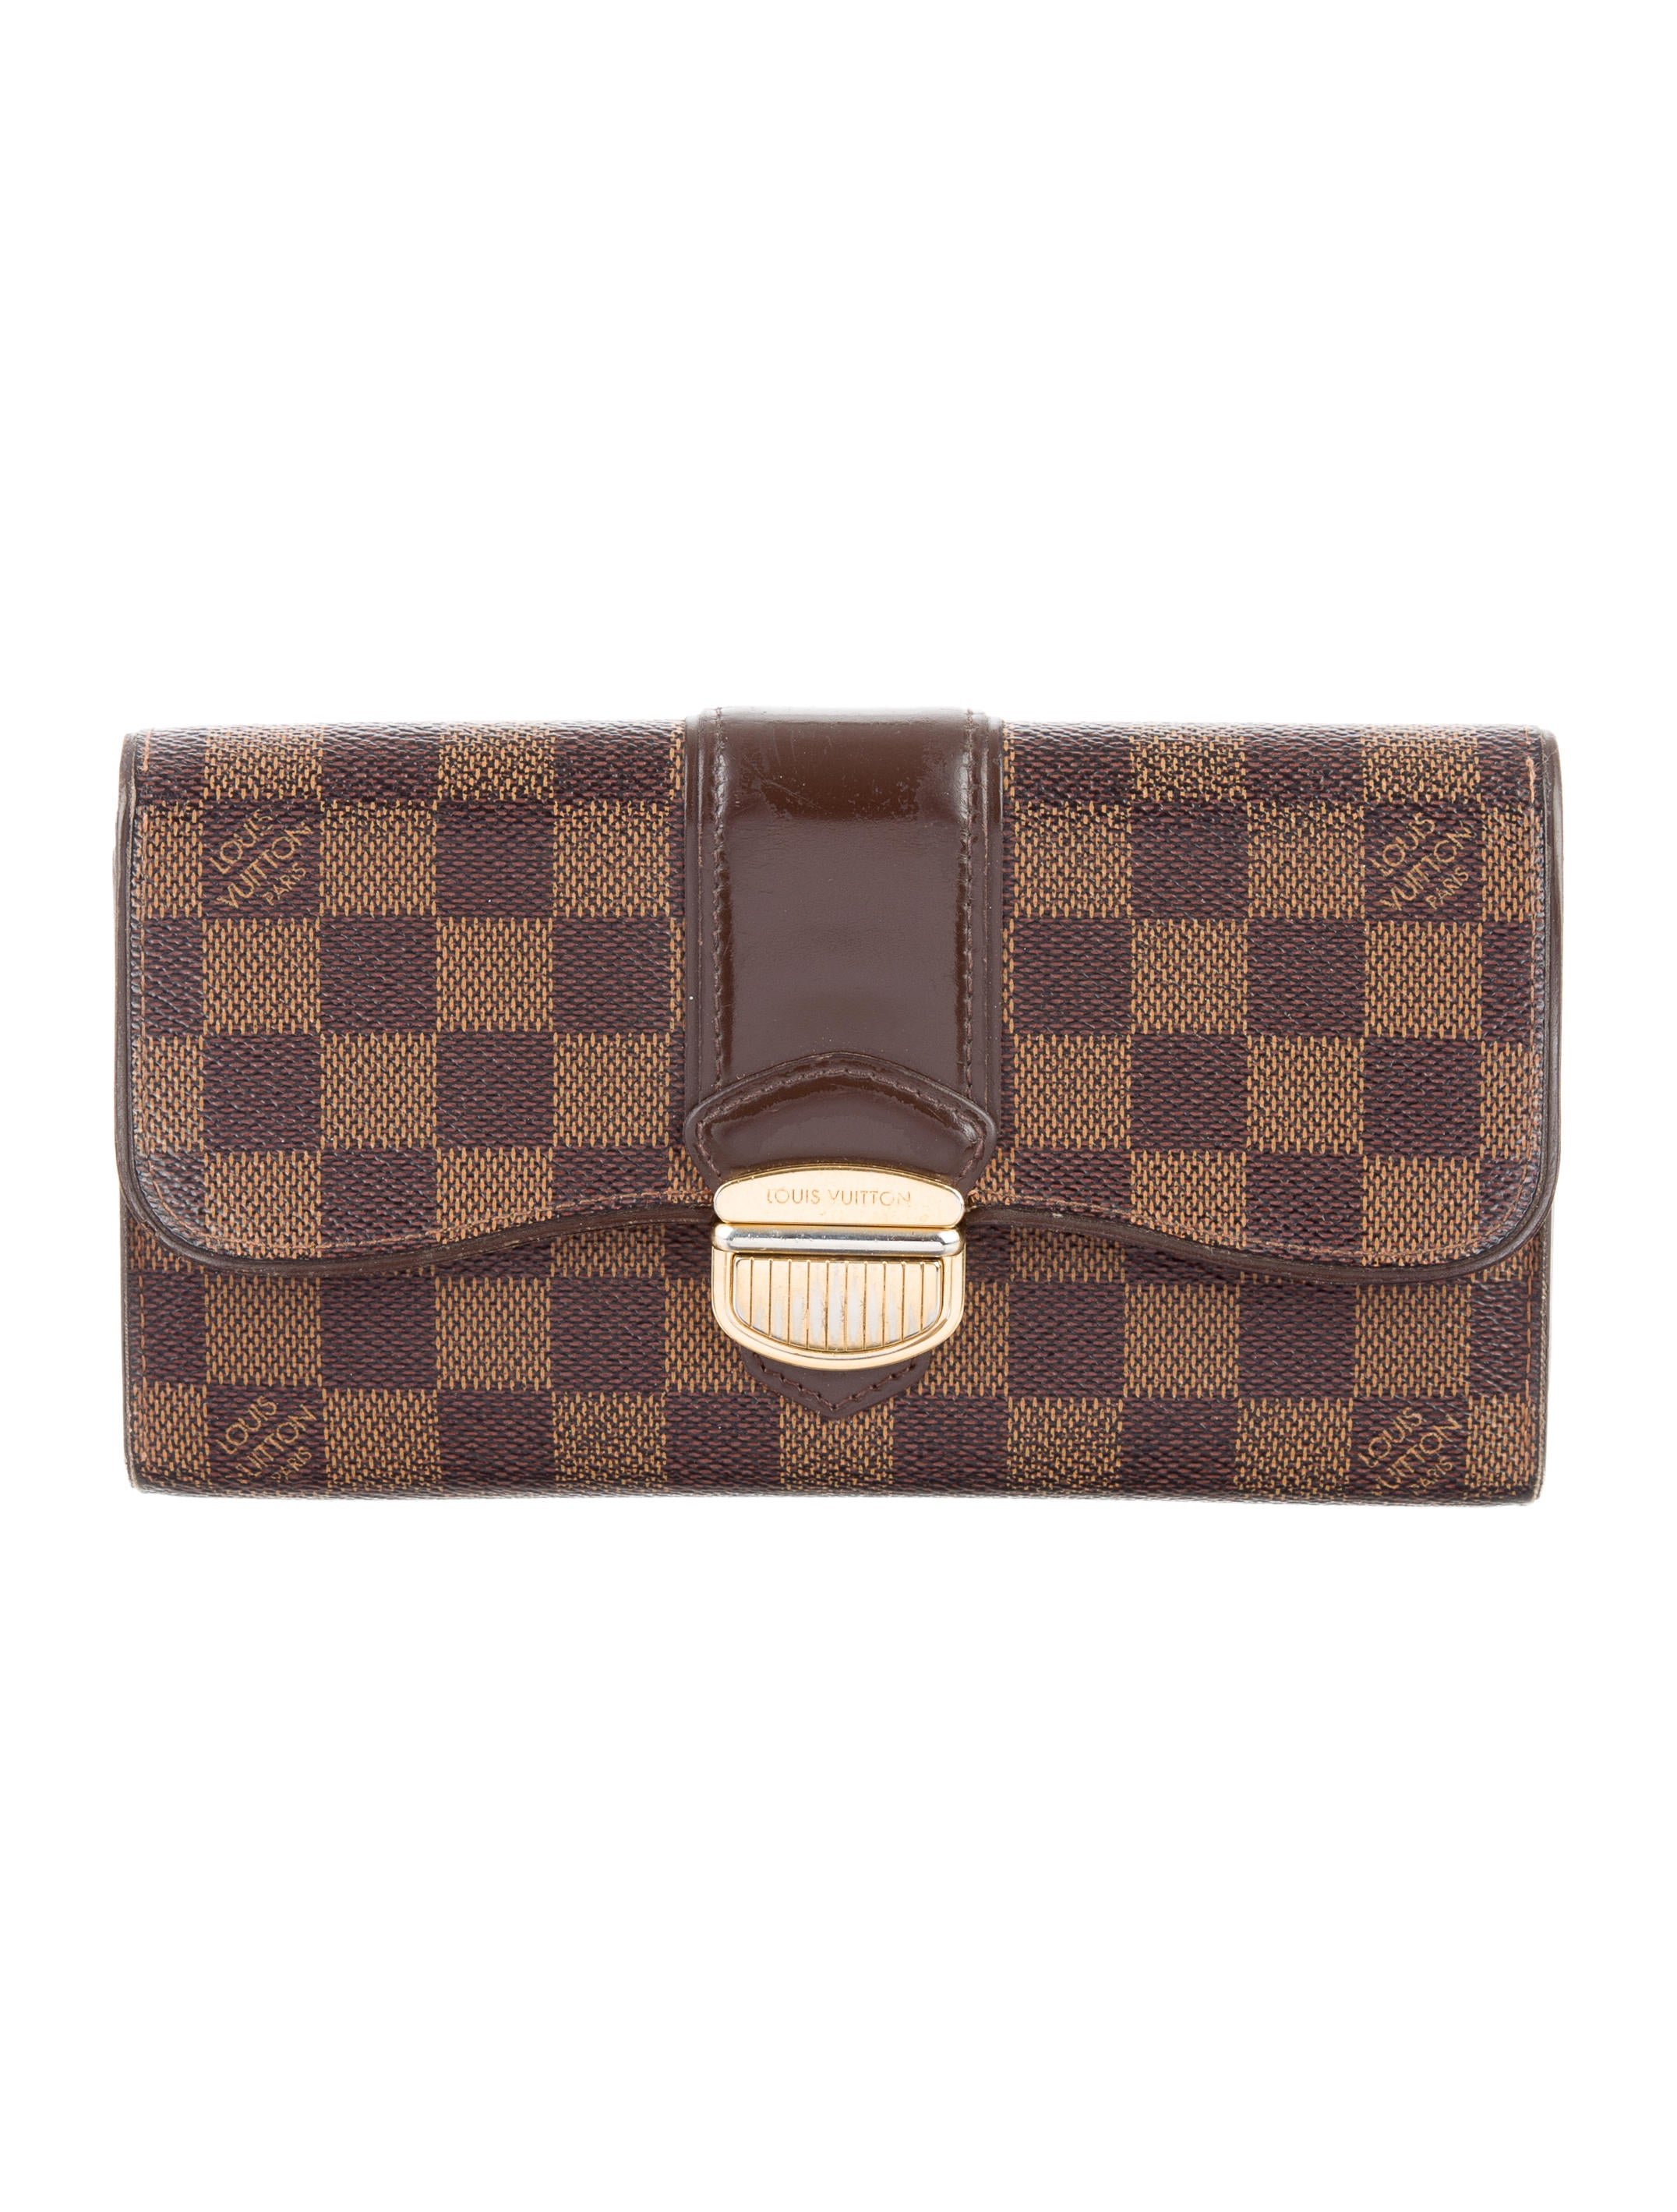 7d7e359471cfb Louis Vuitton Damier Ebene Sistina Wallet - Accessories - LOU114640 ...